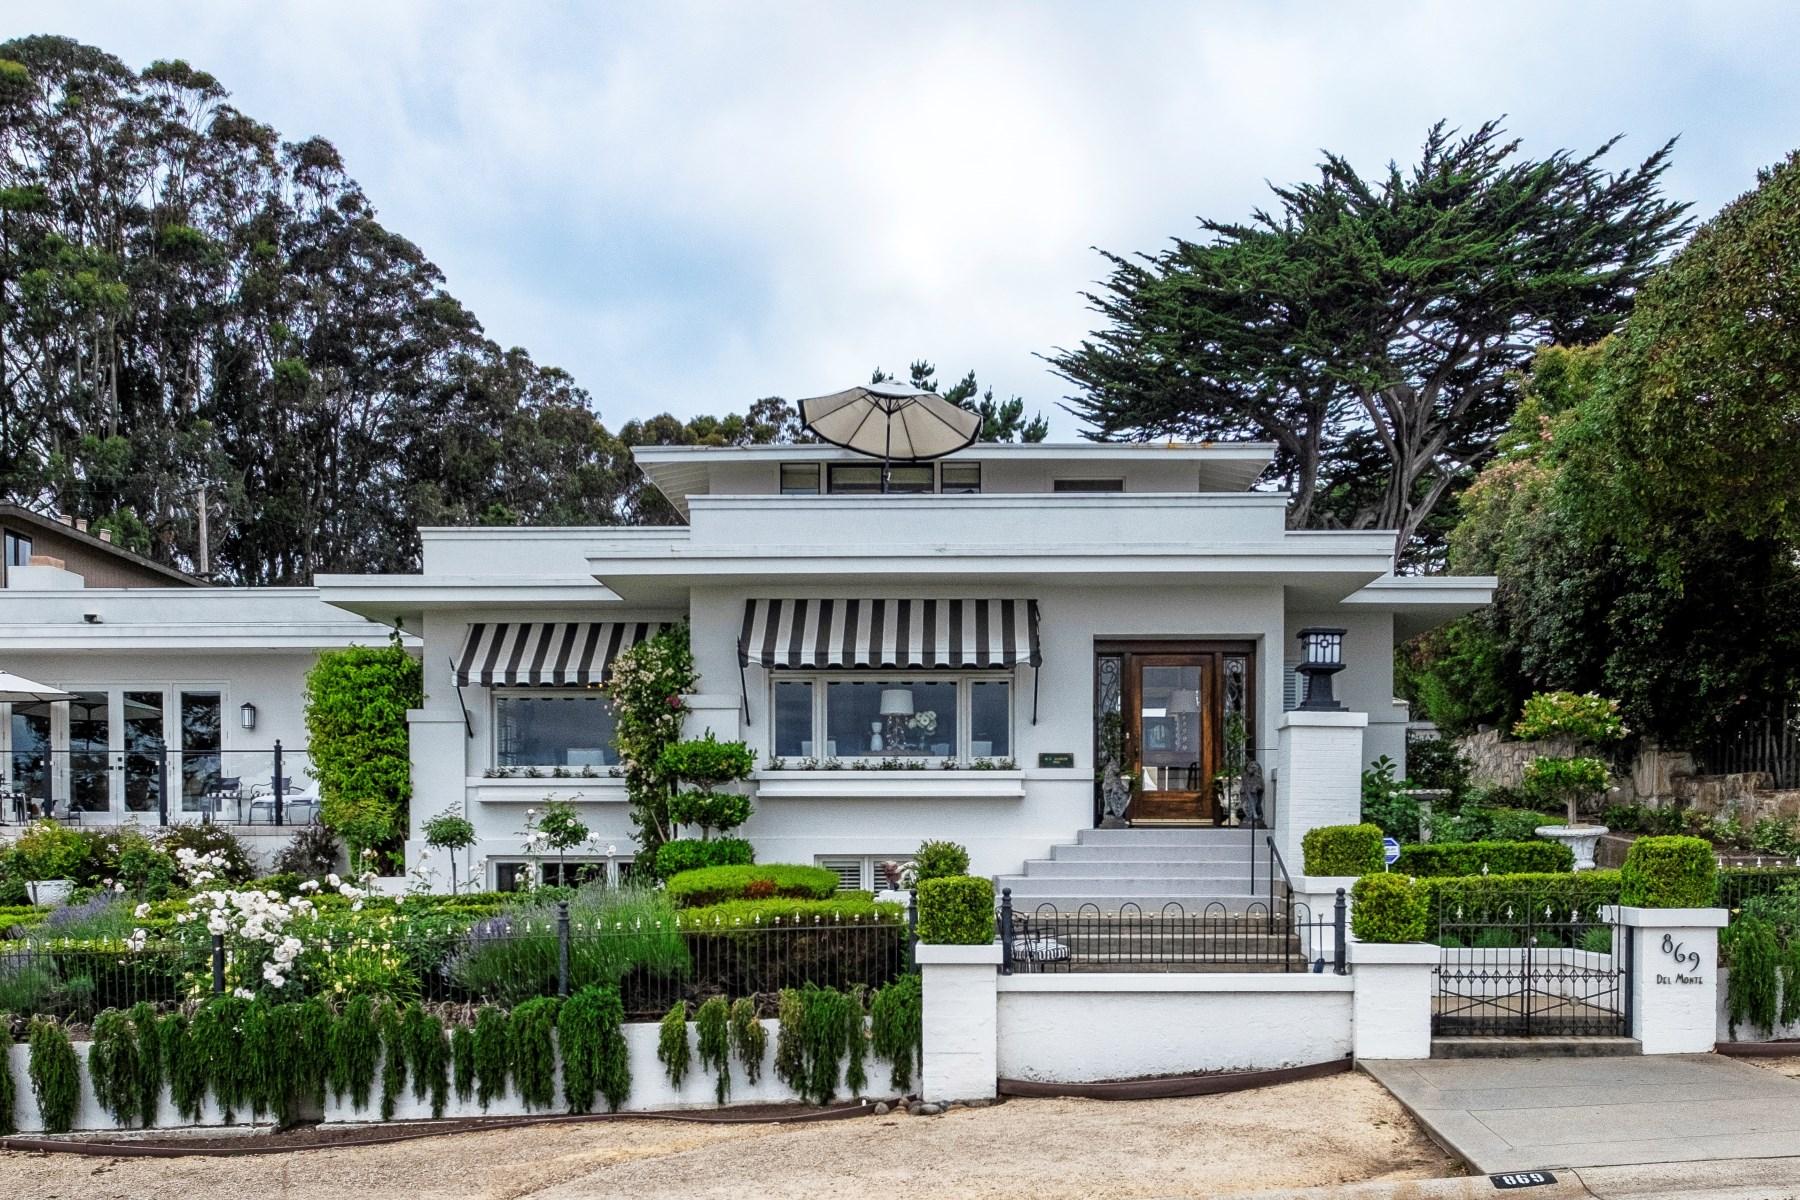 Single Family Home for Sale at Architectural Masterpiece 869 Del Monte Blvd Pacific Grove, California, 93950 United States